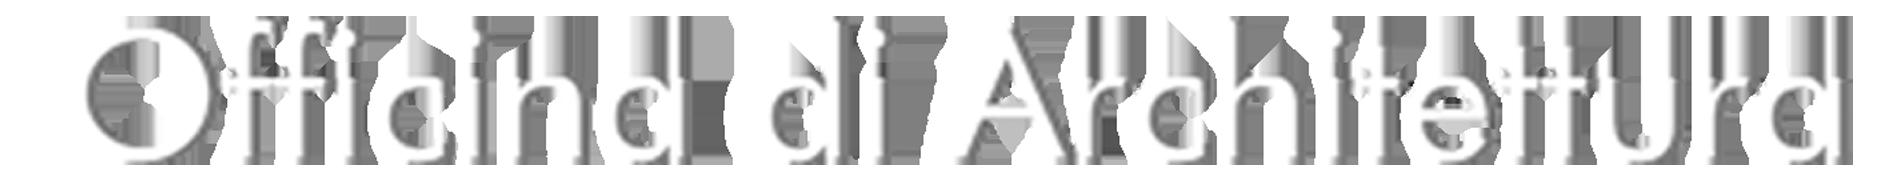 Officina di architettura officina di architettura for Logo sito internet